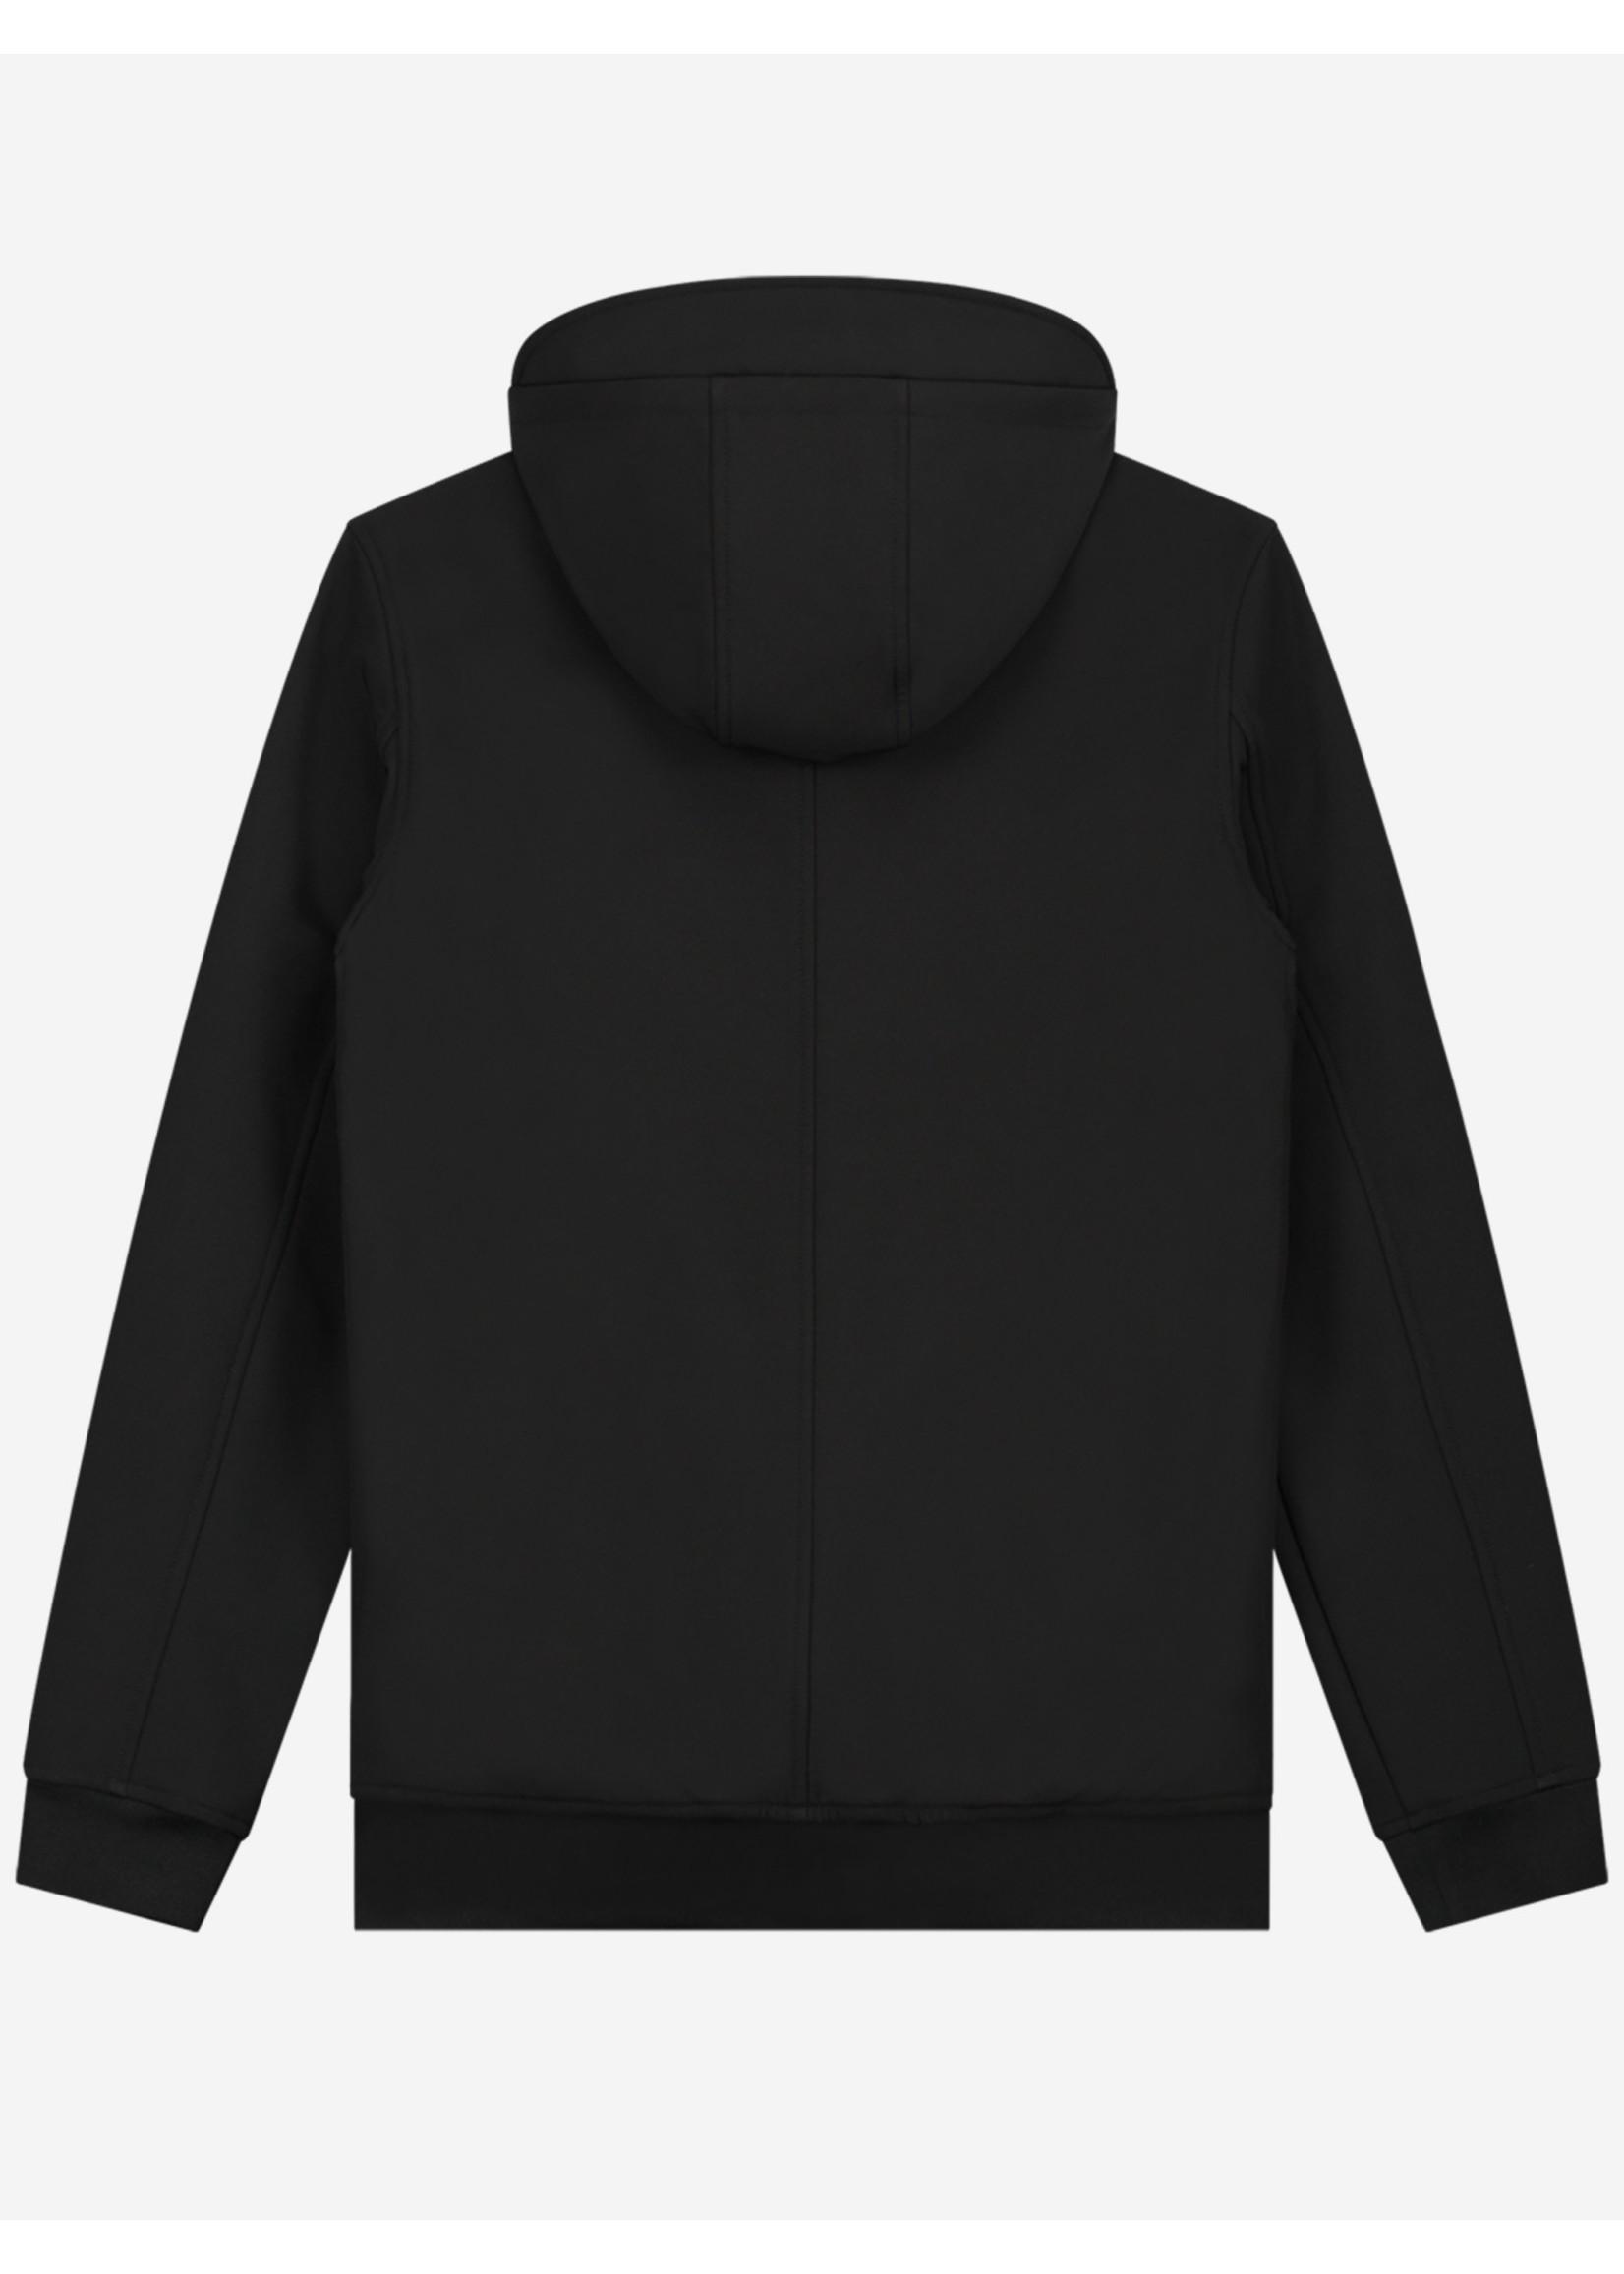 Sustain Sustain Softshell Logo Hoodie - Black